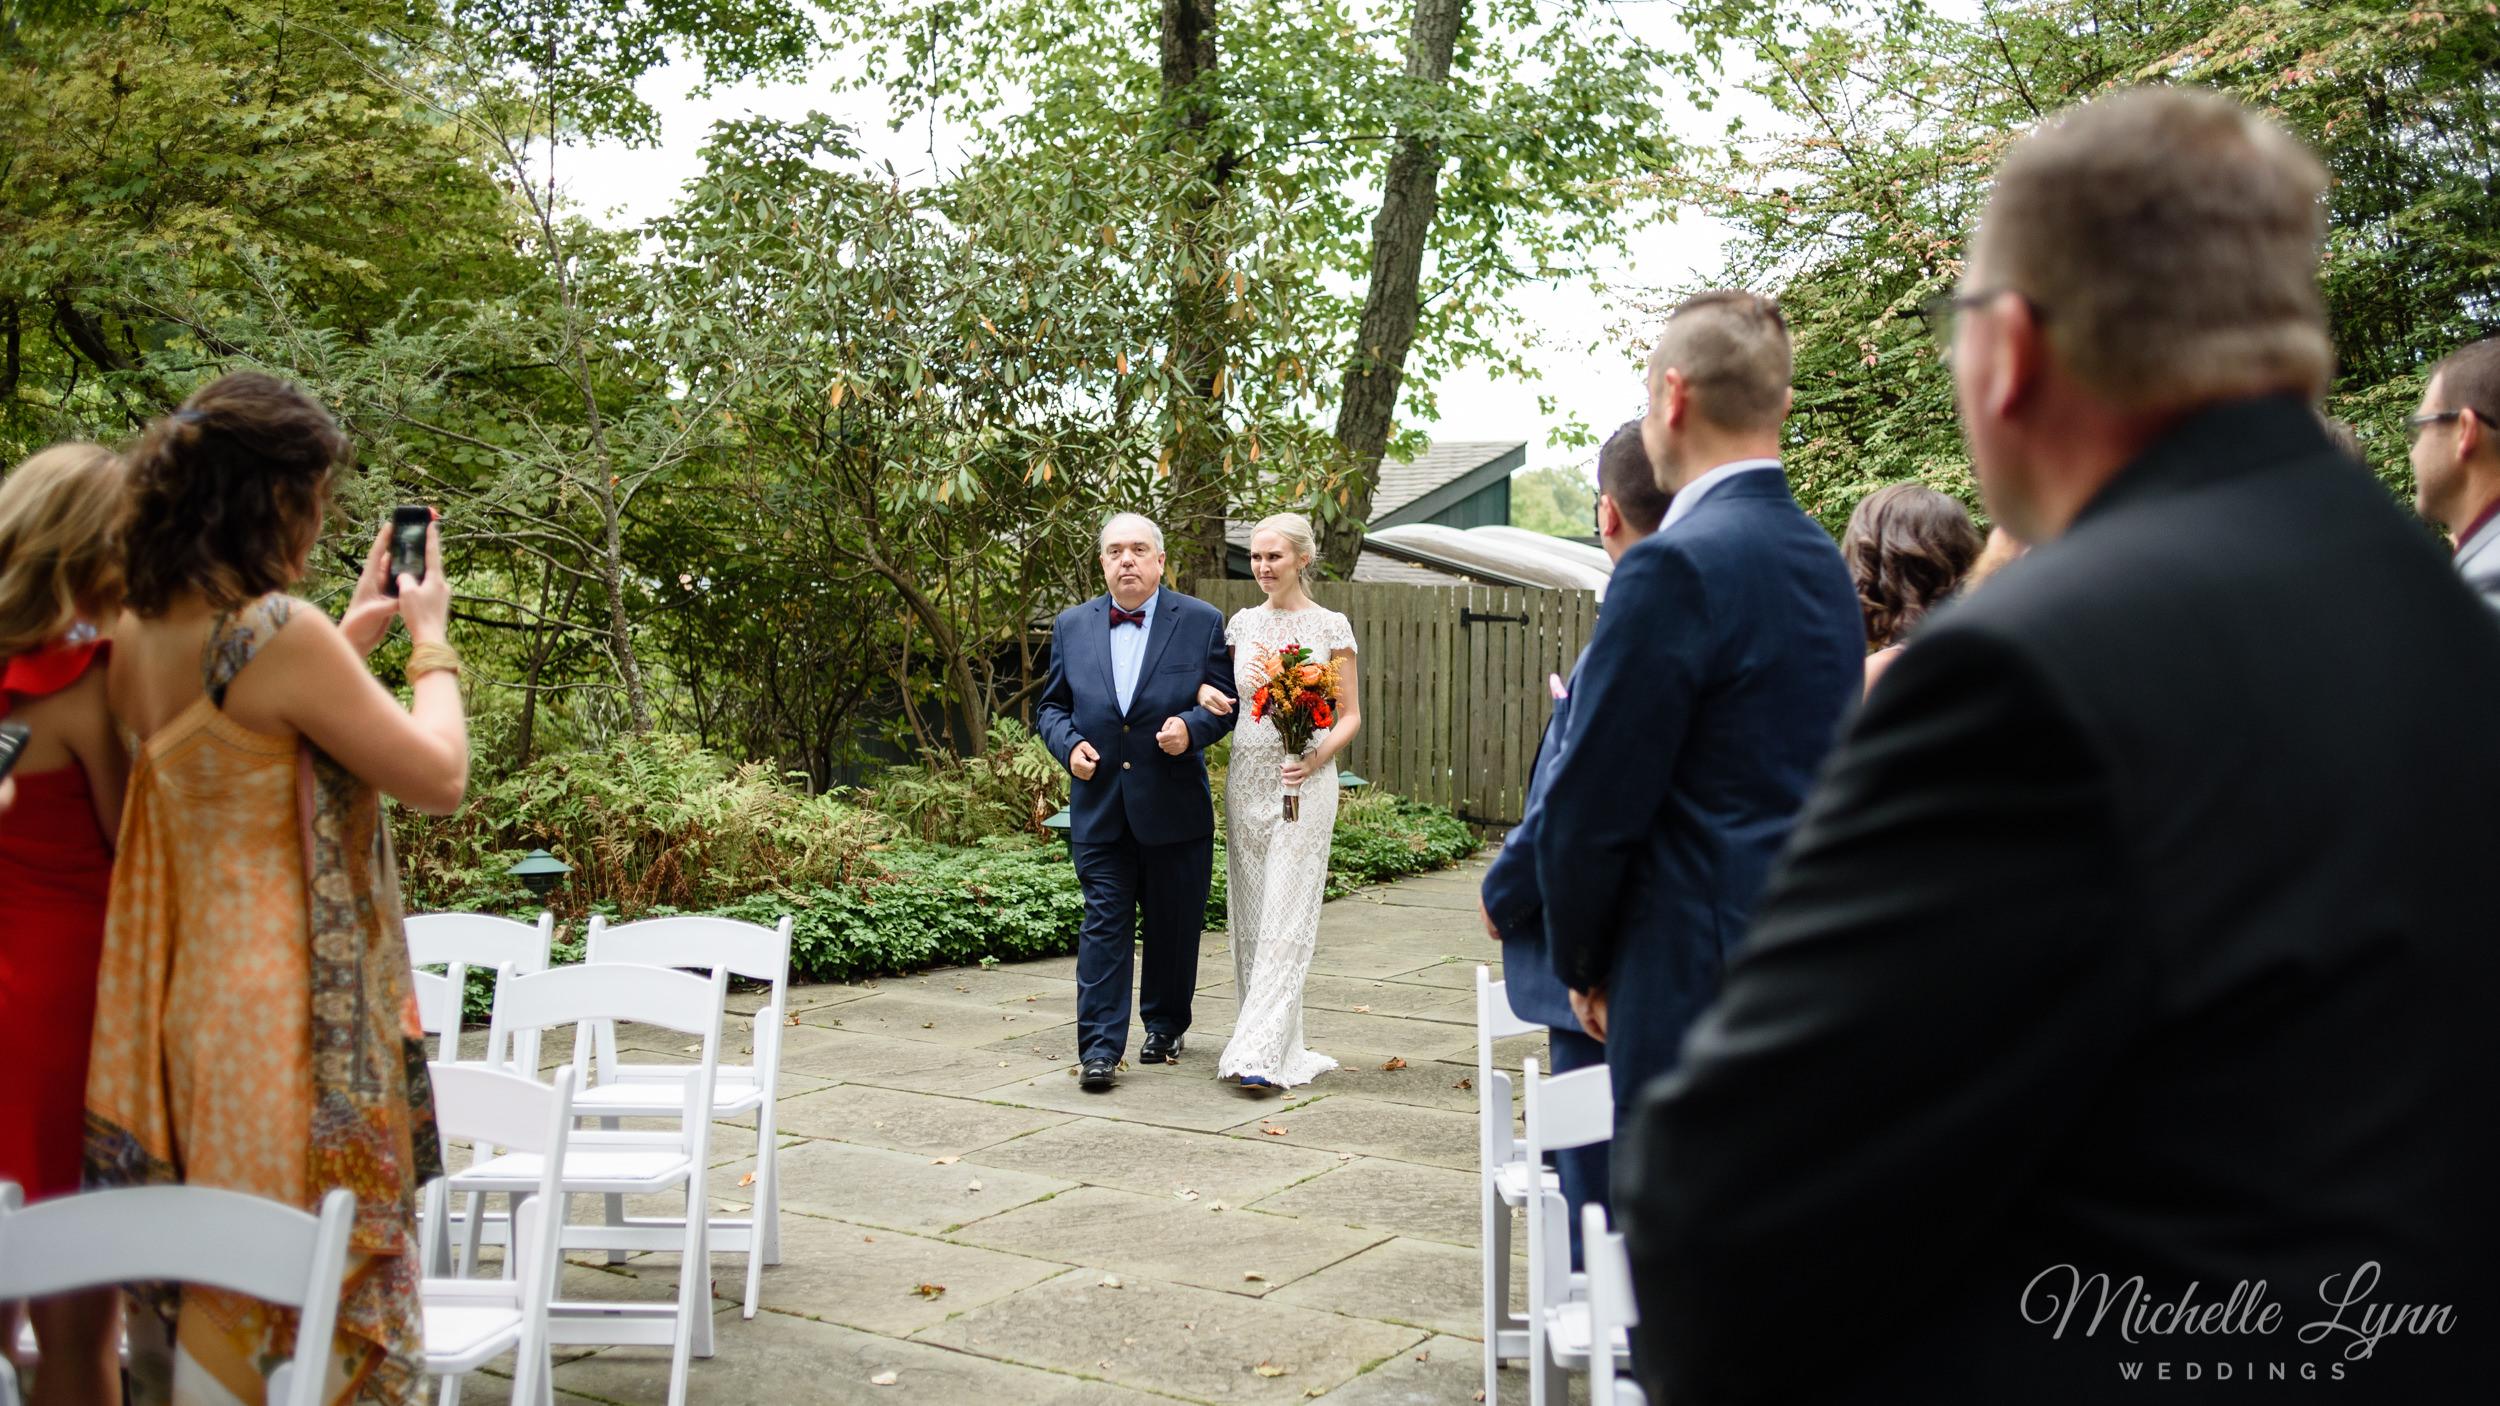 mlw-lumberville-general-store-new-hope-wedding-photographer-36.jpg